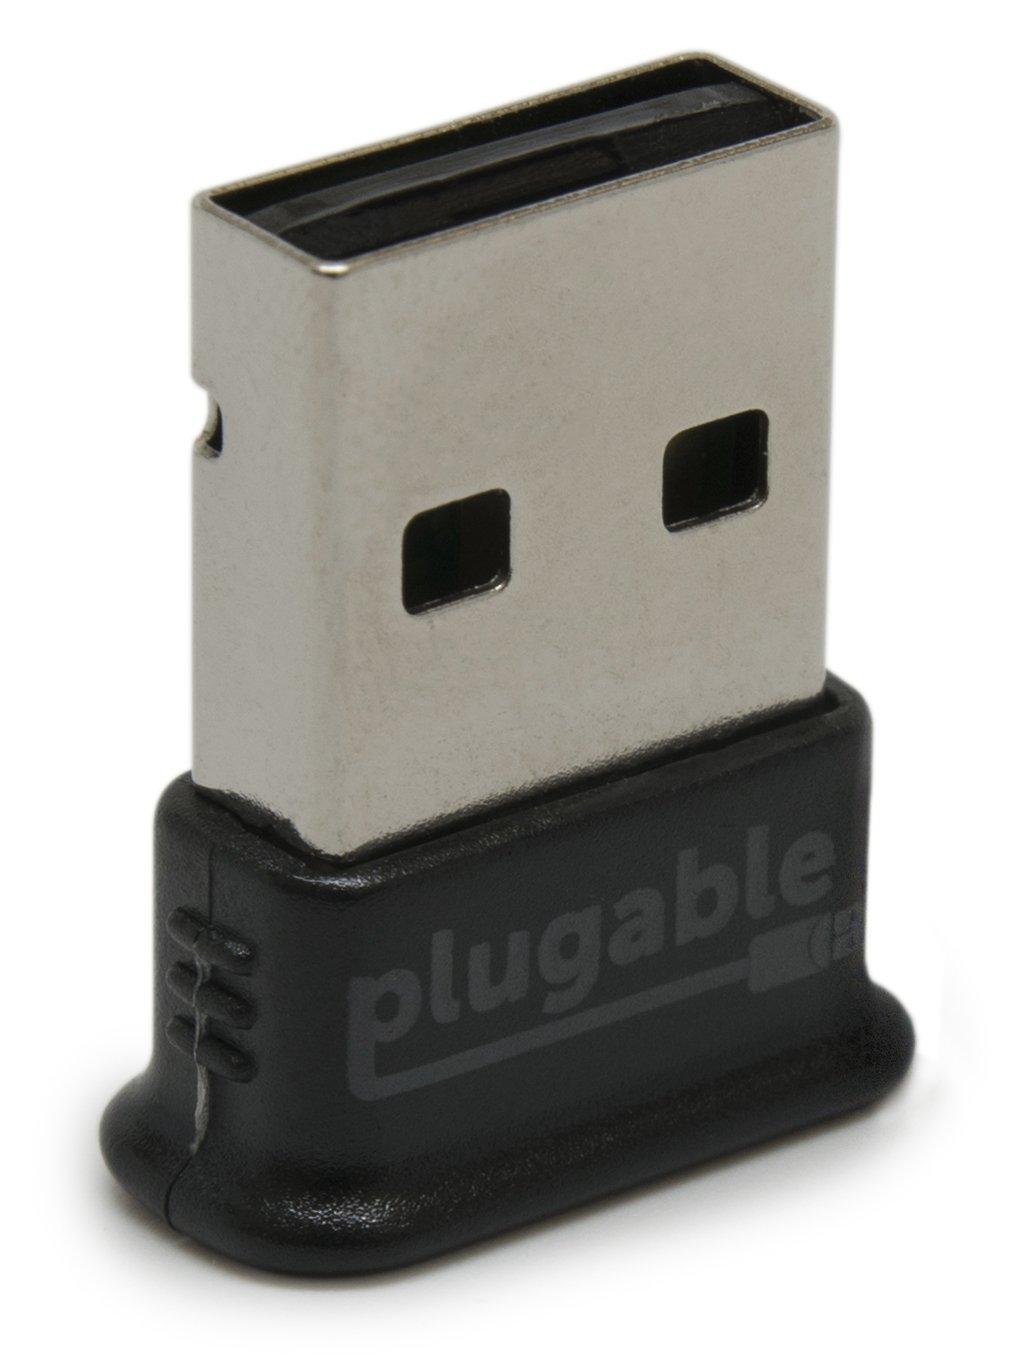 Windows10,8.1,8,7 USB-BT4LE Plugable USB Bluetooth 4.0 Low Energy Micro Adapter